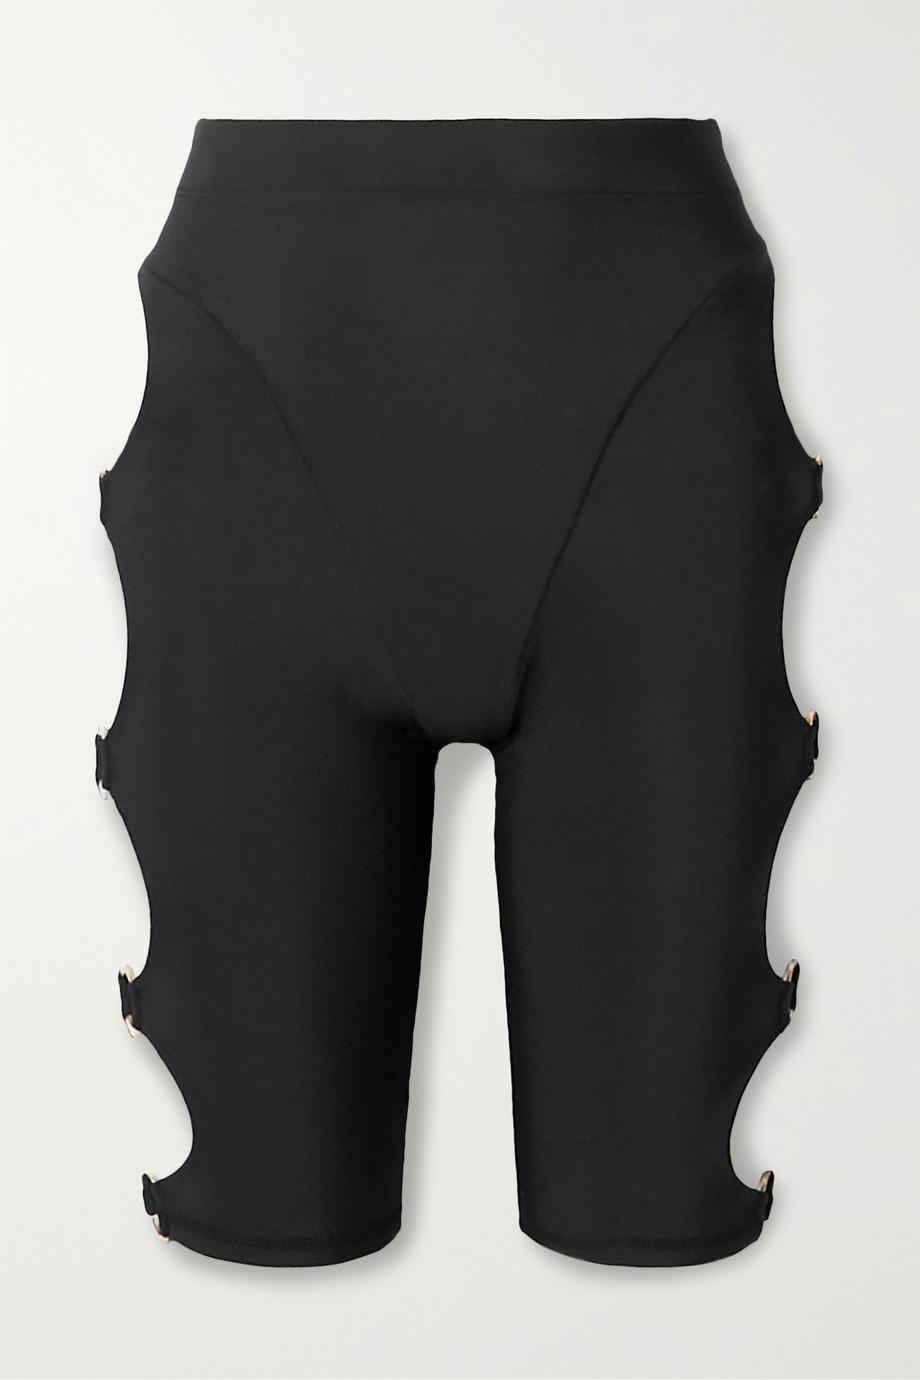 Adam Selman Sport Cutout embellished stretch shorts